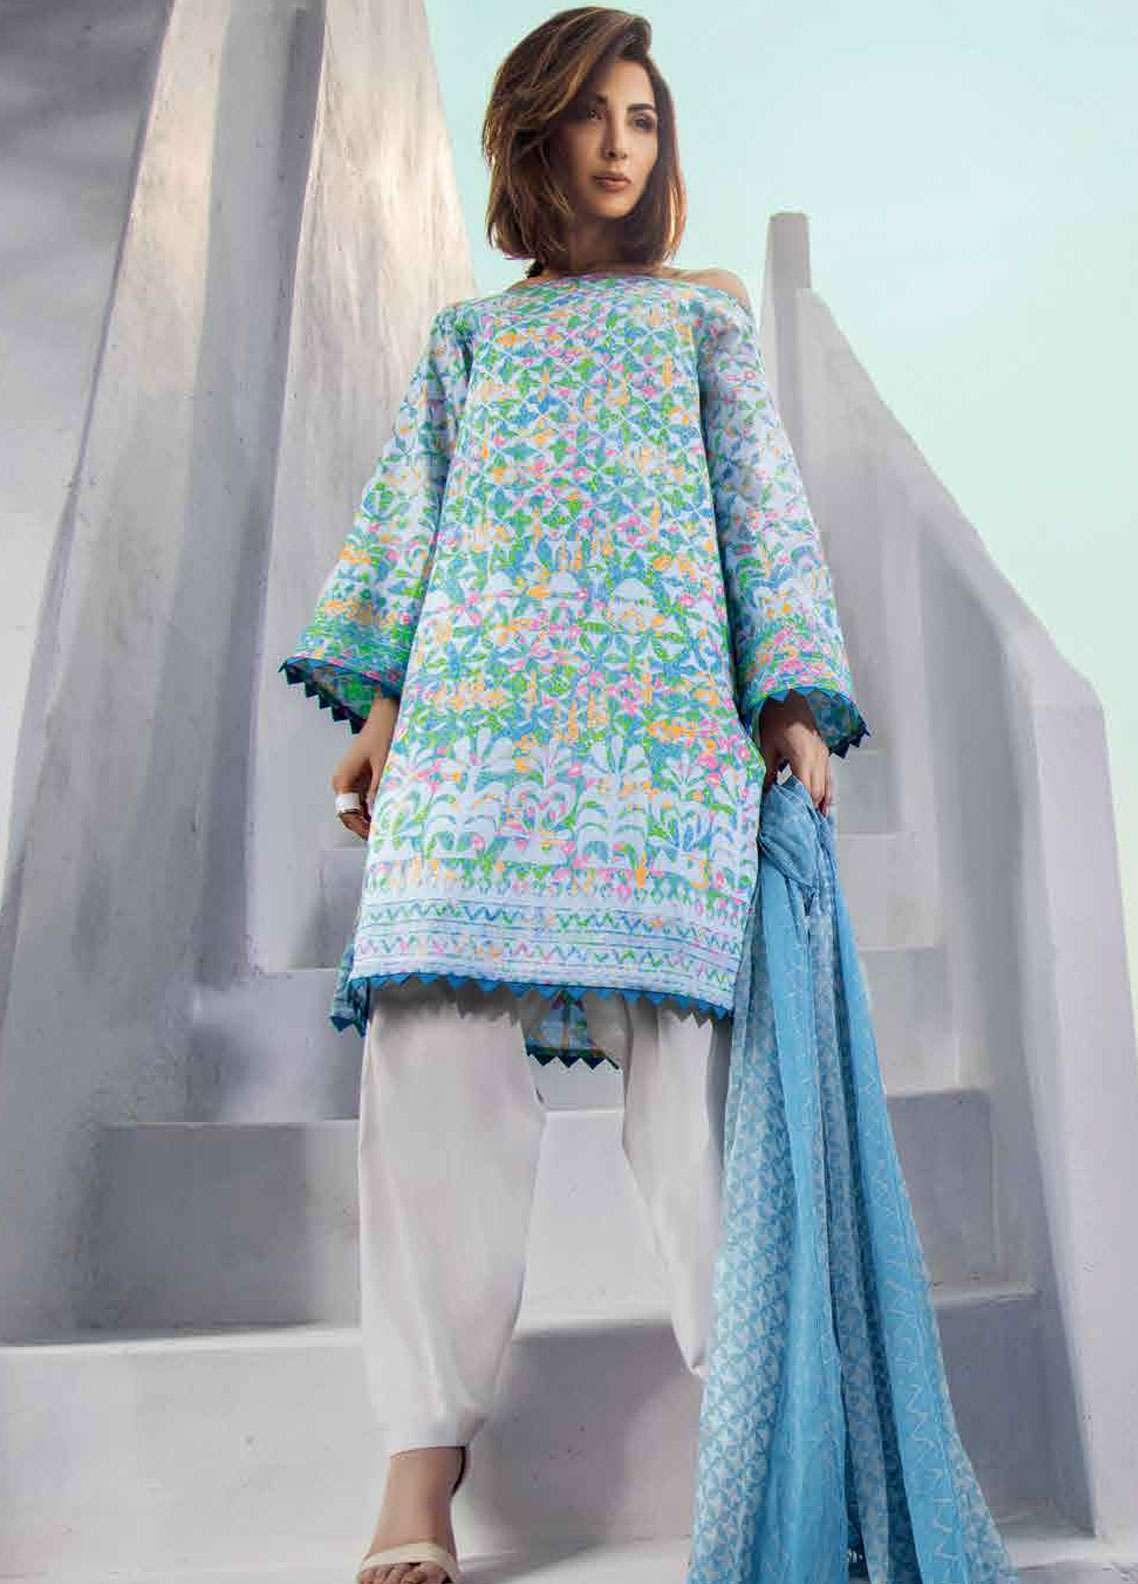 Al Karam Printed Lawn Unstitched 3 Piece Suit AK19L SS-16.1-19 Blue - Spring / Summer Collection